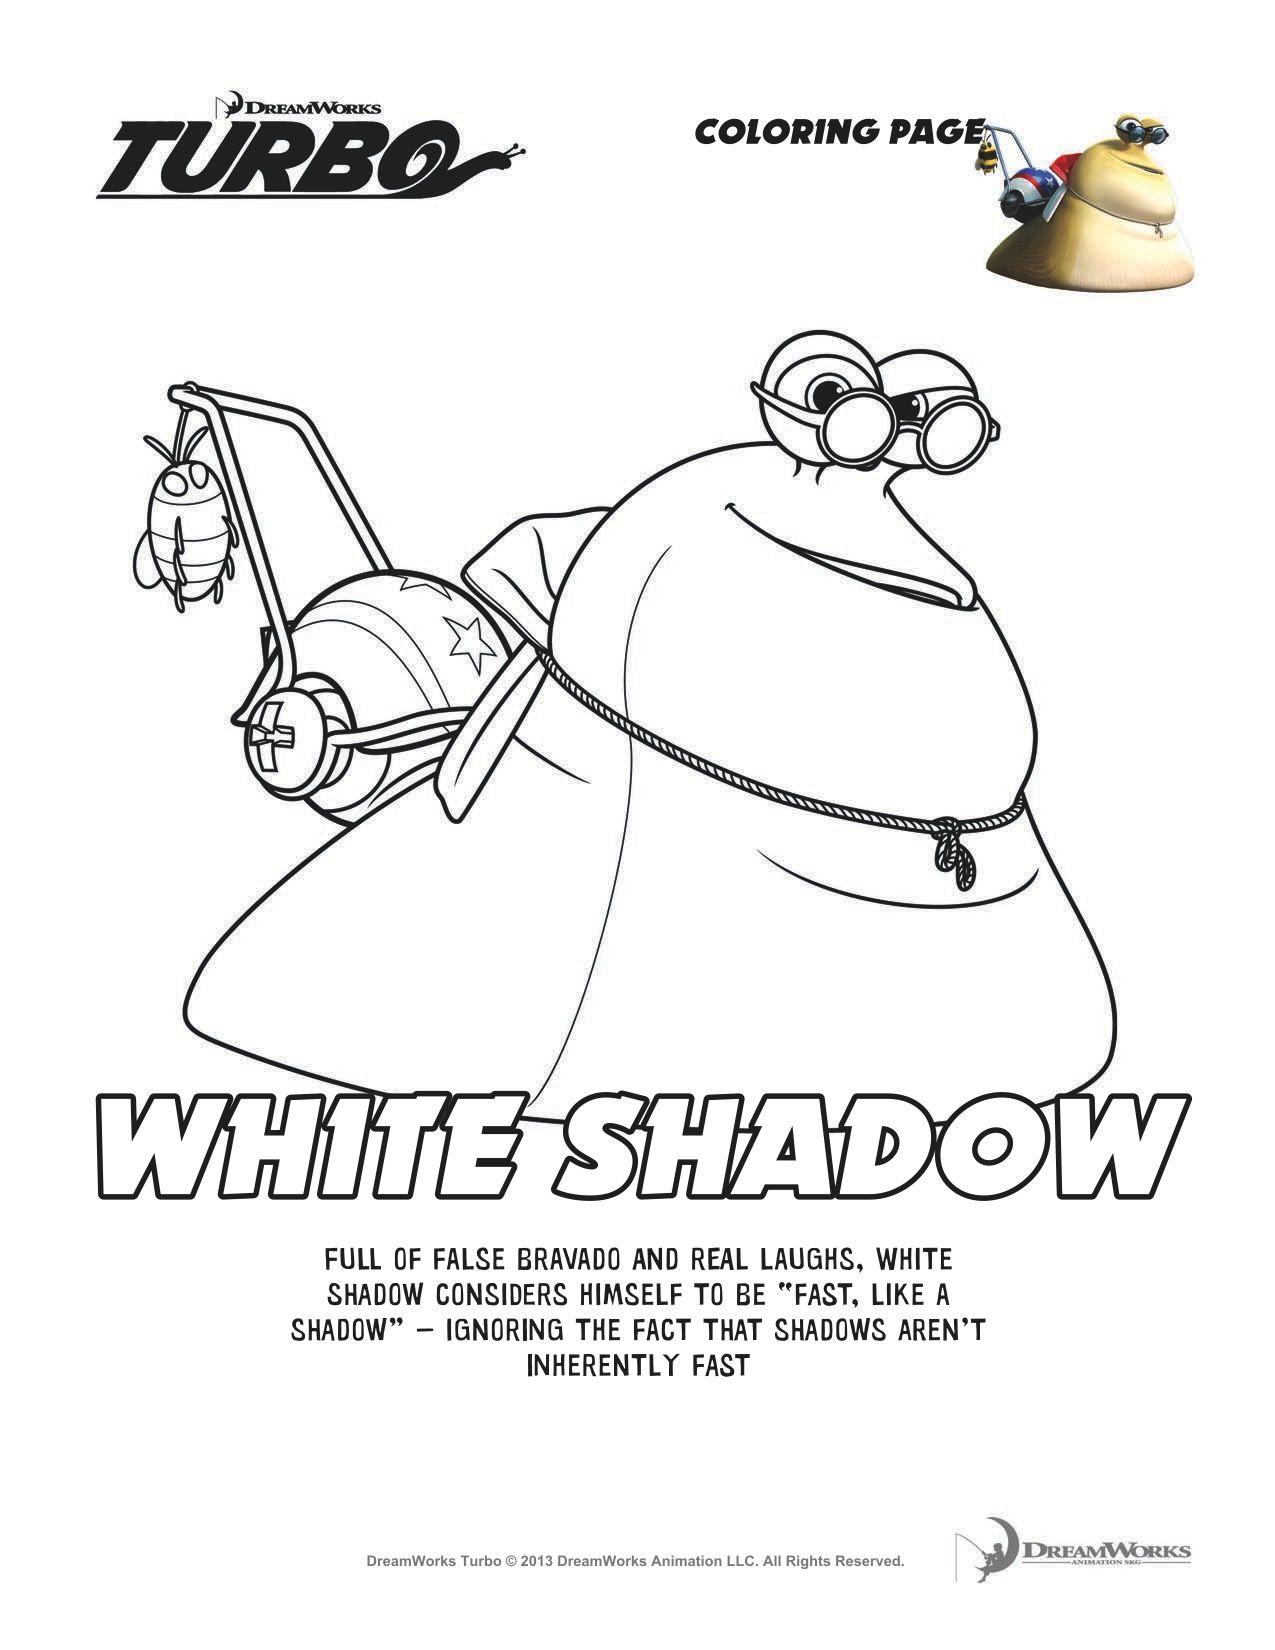 Turbo White Shadow Coloring Sheet